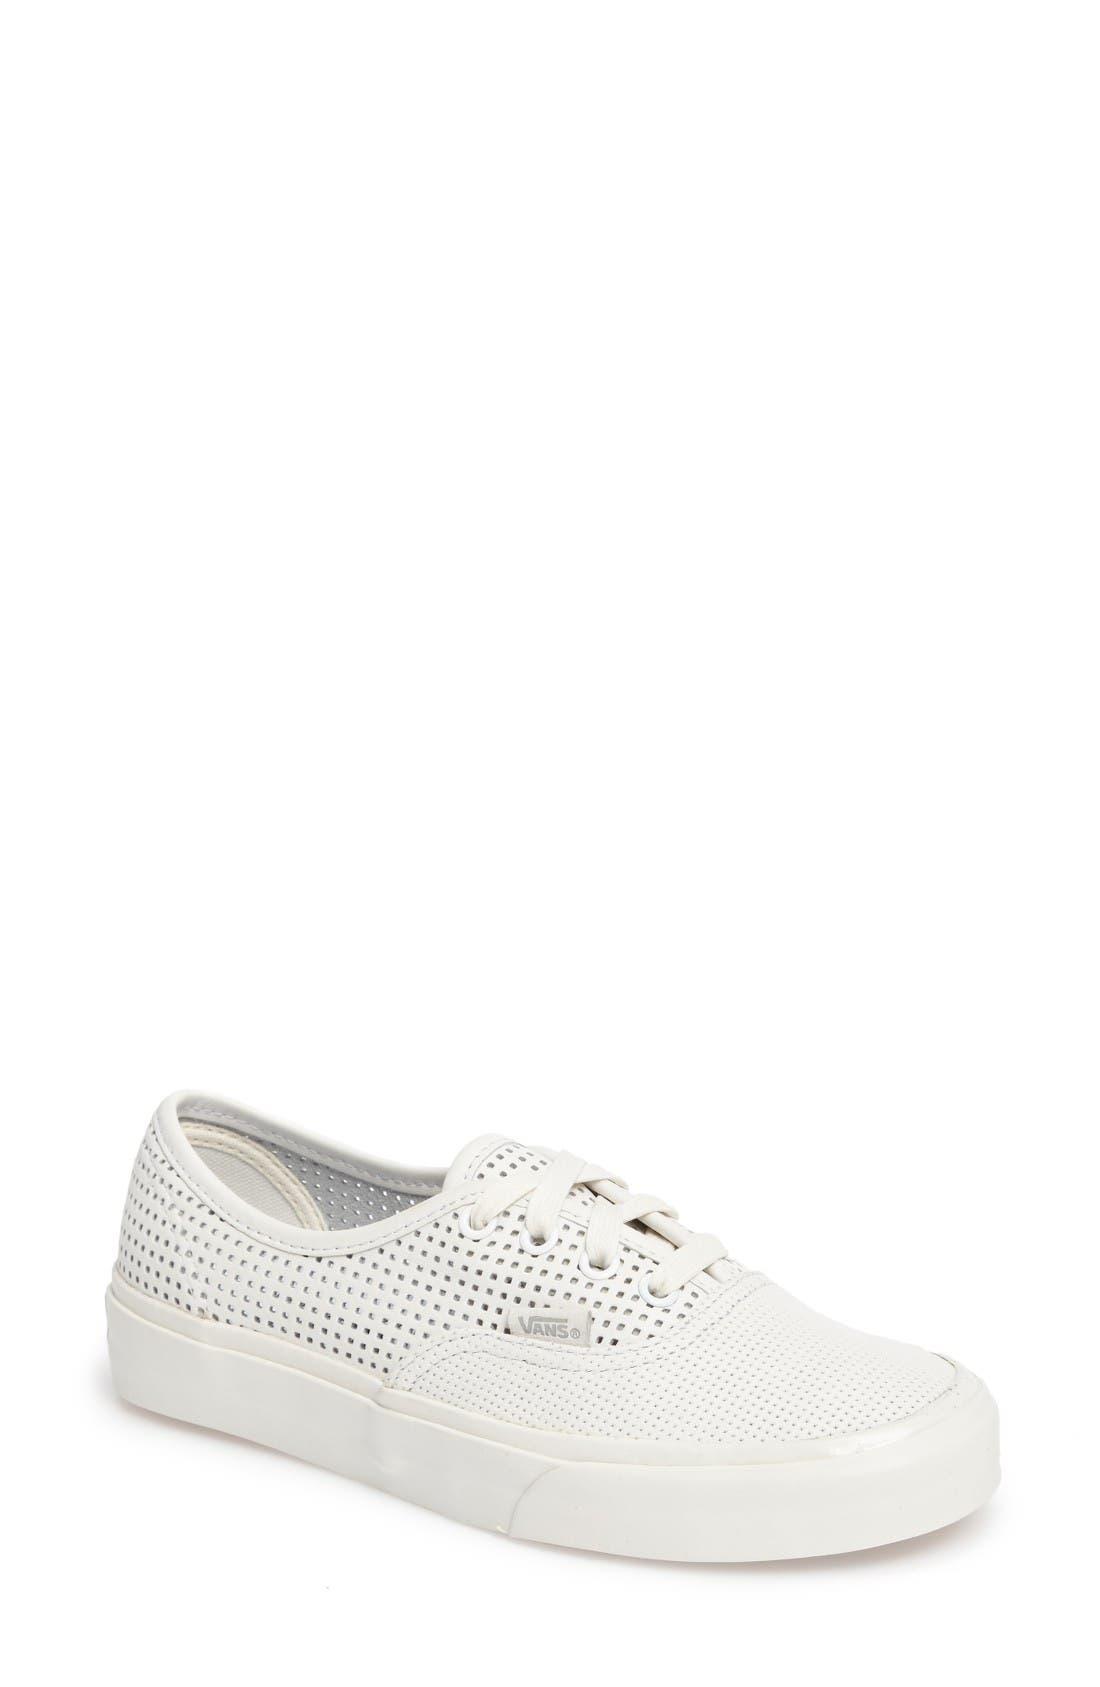 Vans Authentic DX Perforated Sneaker (Women)